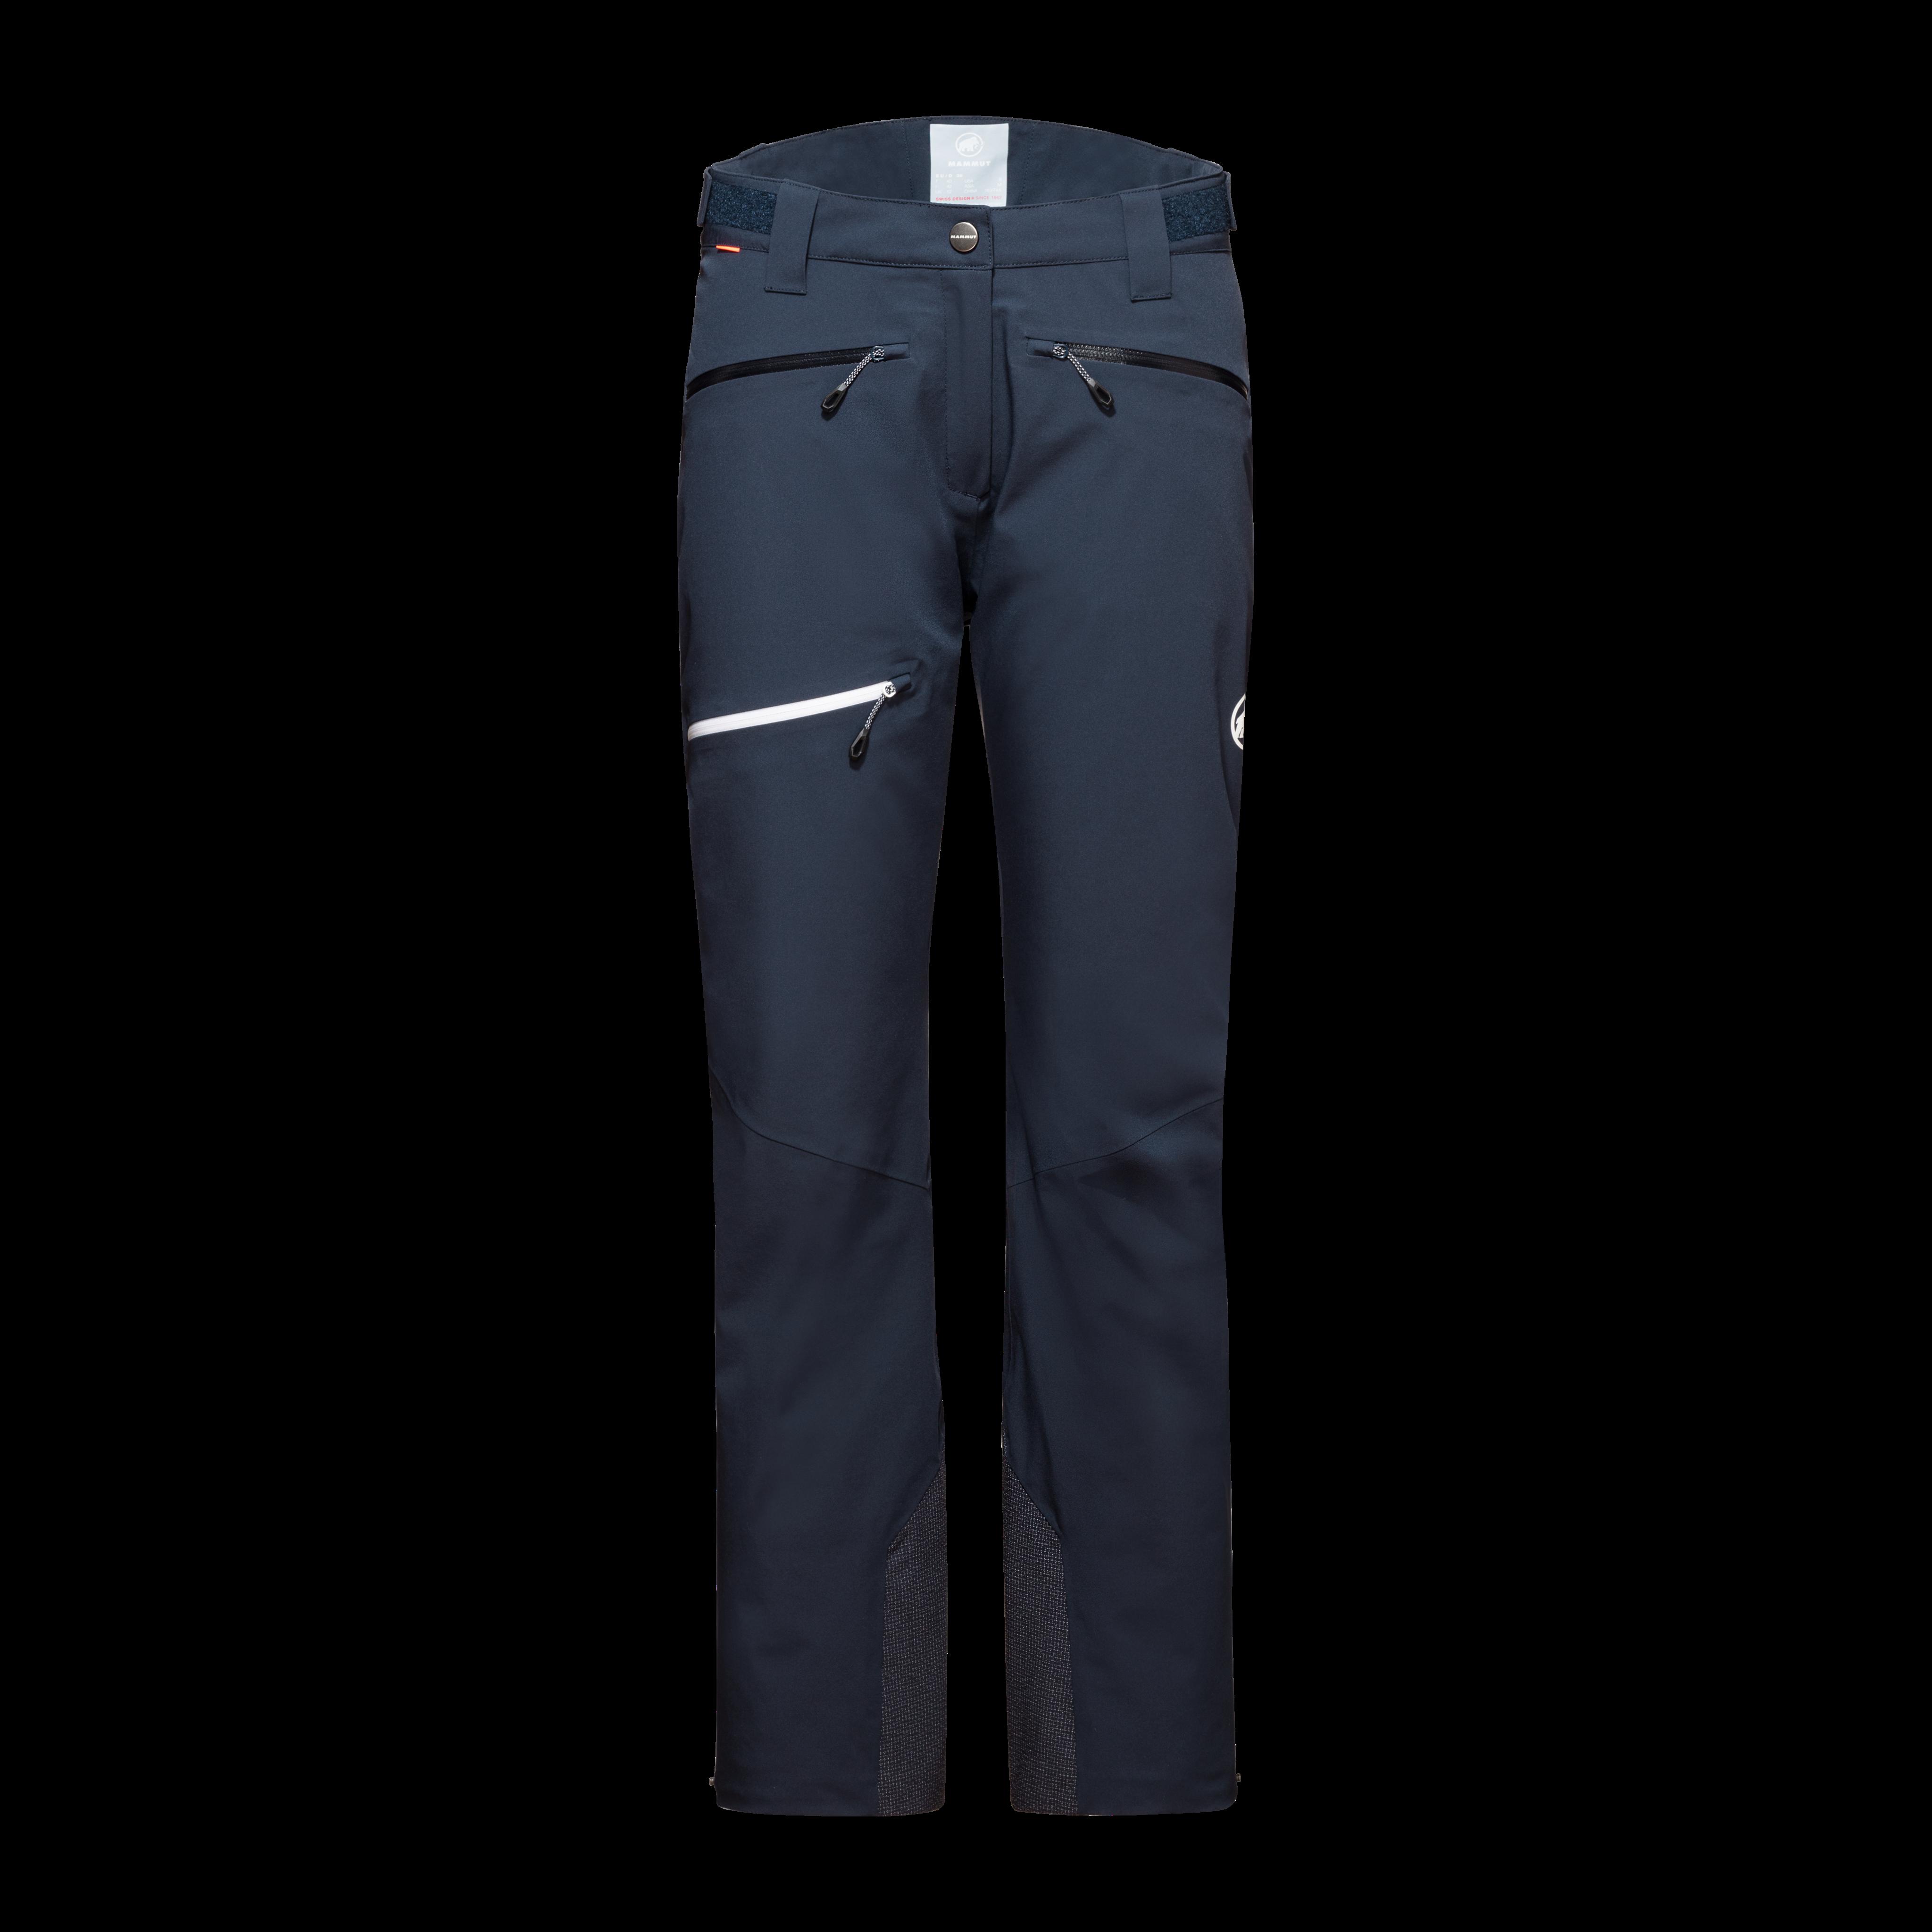 Stoney HS Thermo Pants Women - marine-white, normal, UK 12 thumbnail